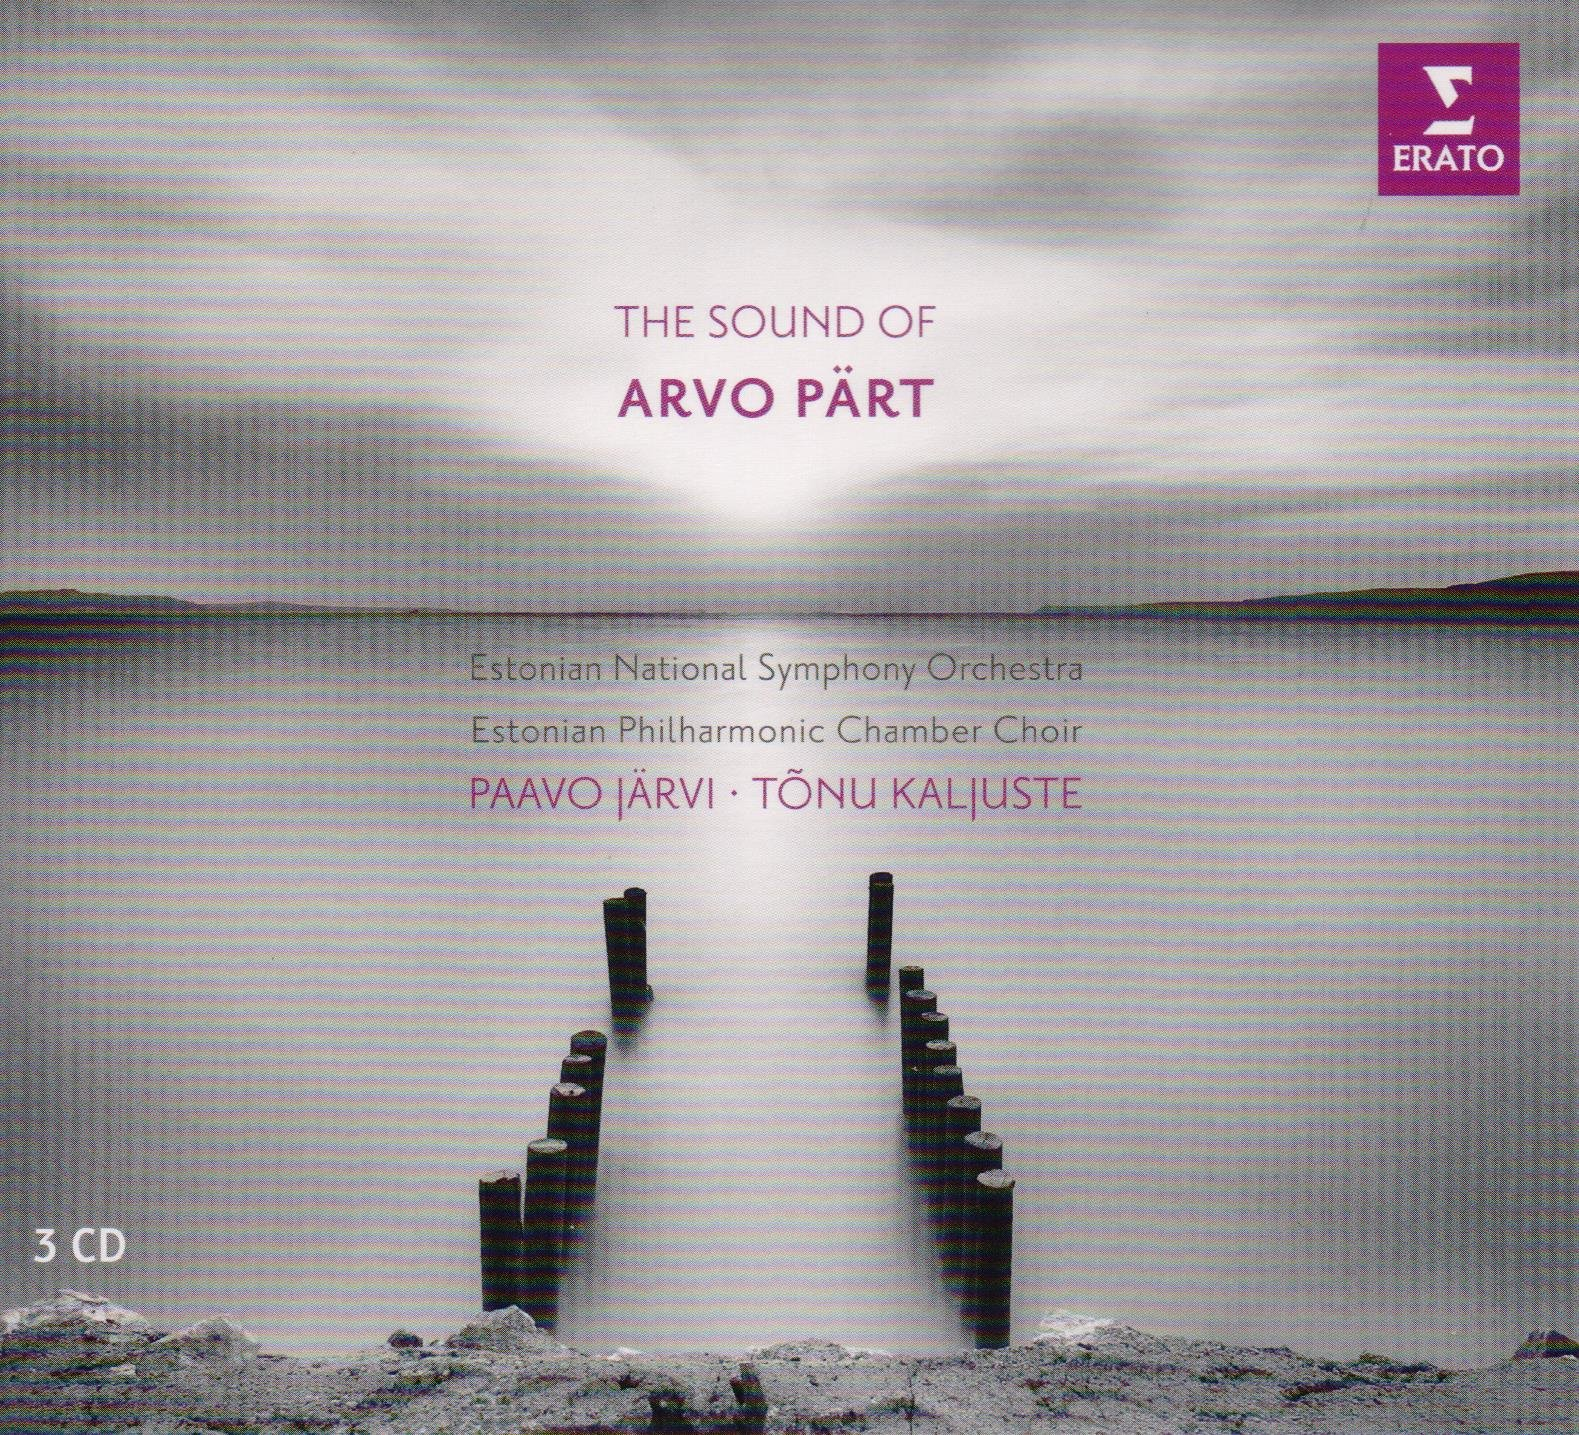 The Sound of Arvo Part